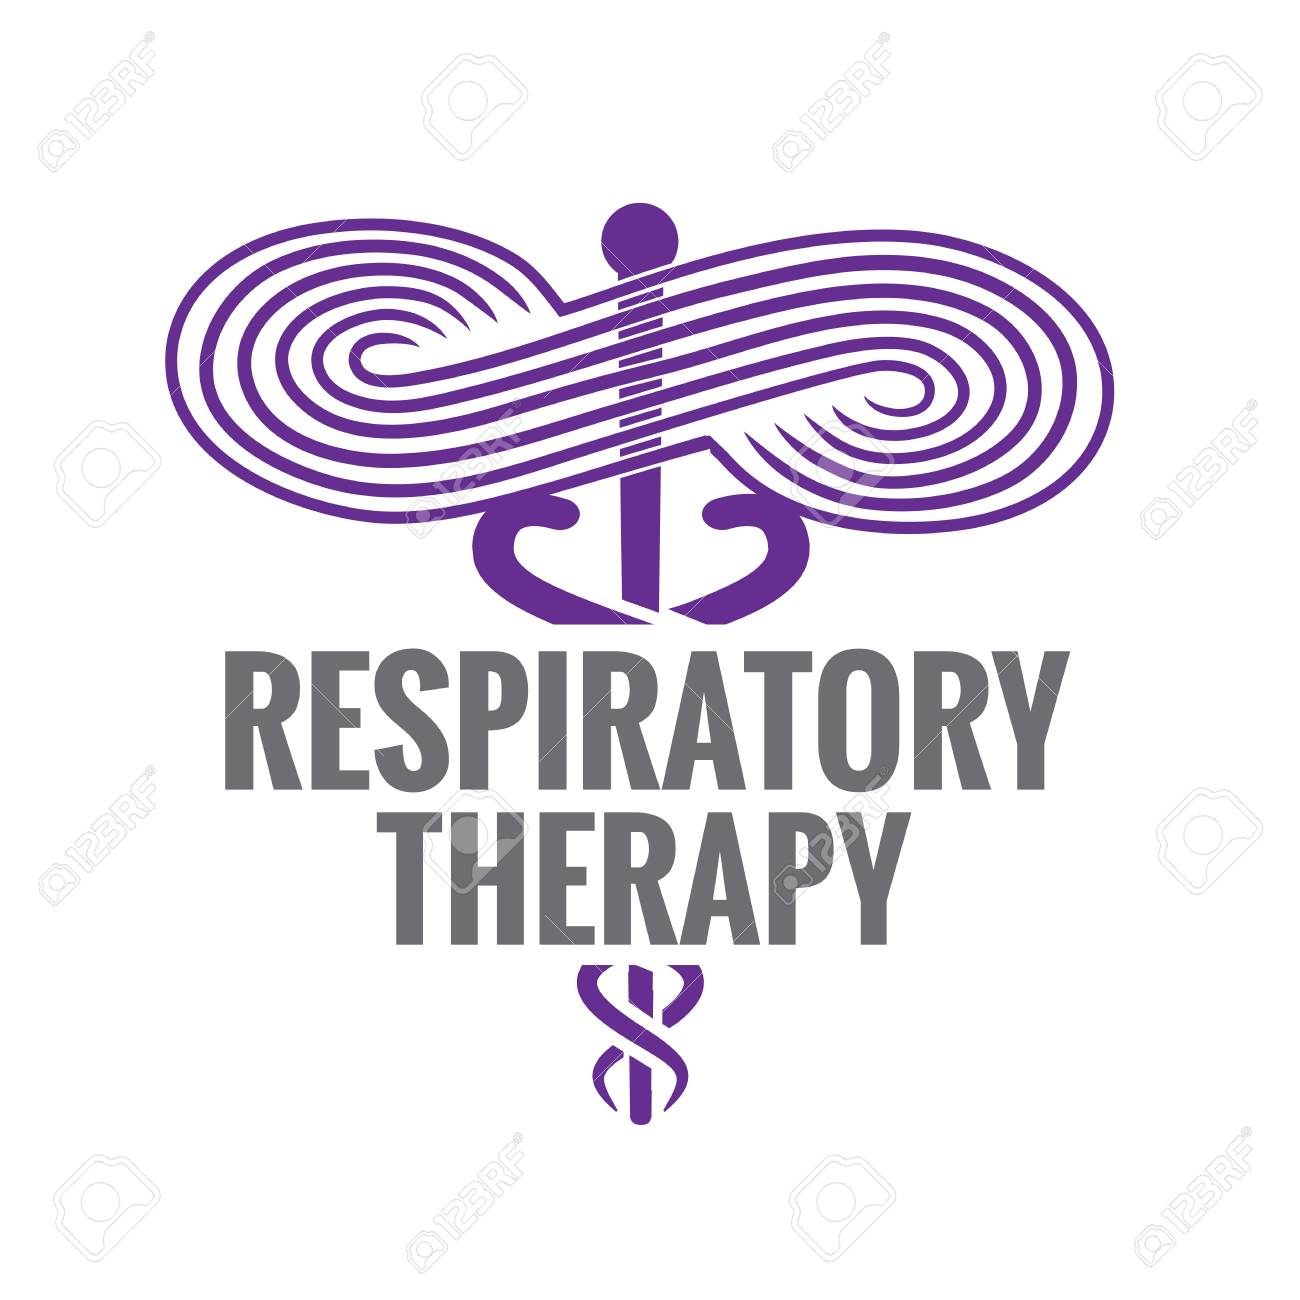 Respiratory therapist medical symbol icon rrt rt or crt royalty respiratory therapist medical symbol icon rrt rt or crt stock vector 88527175 buycottarizona